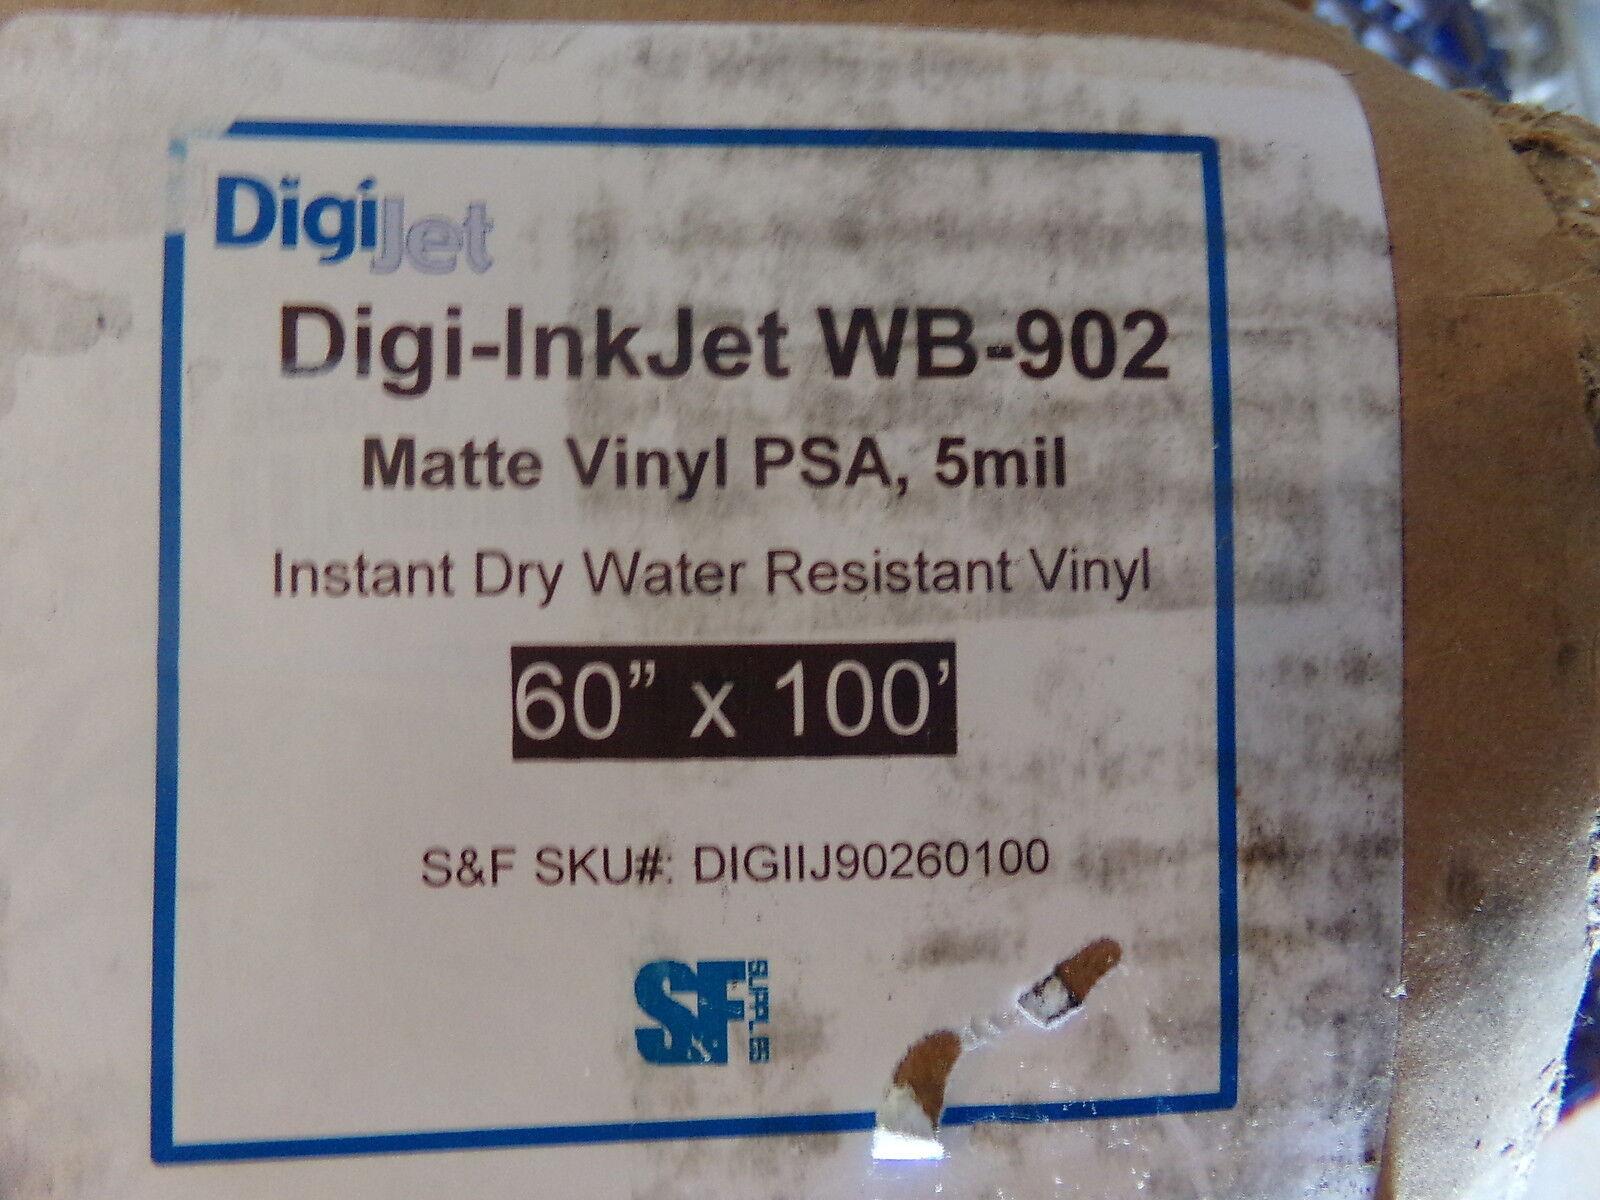 DIGI-INKJET WB-902 MATTE VINYL PSA, 5MIL 60  x100' - NEW (ORIGINAL BOX DAMAGED)